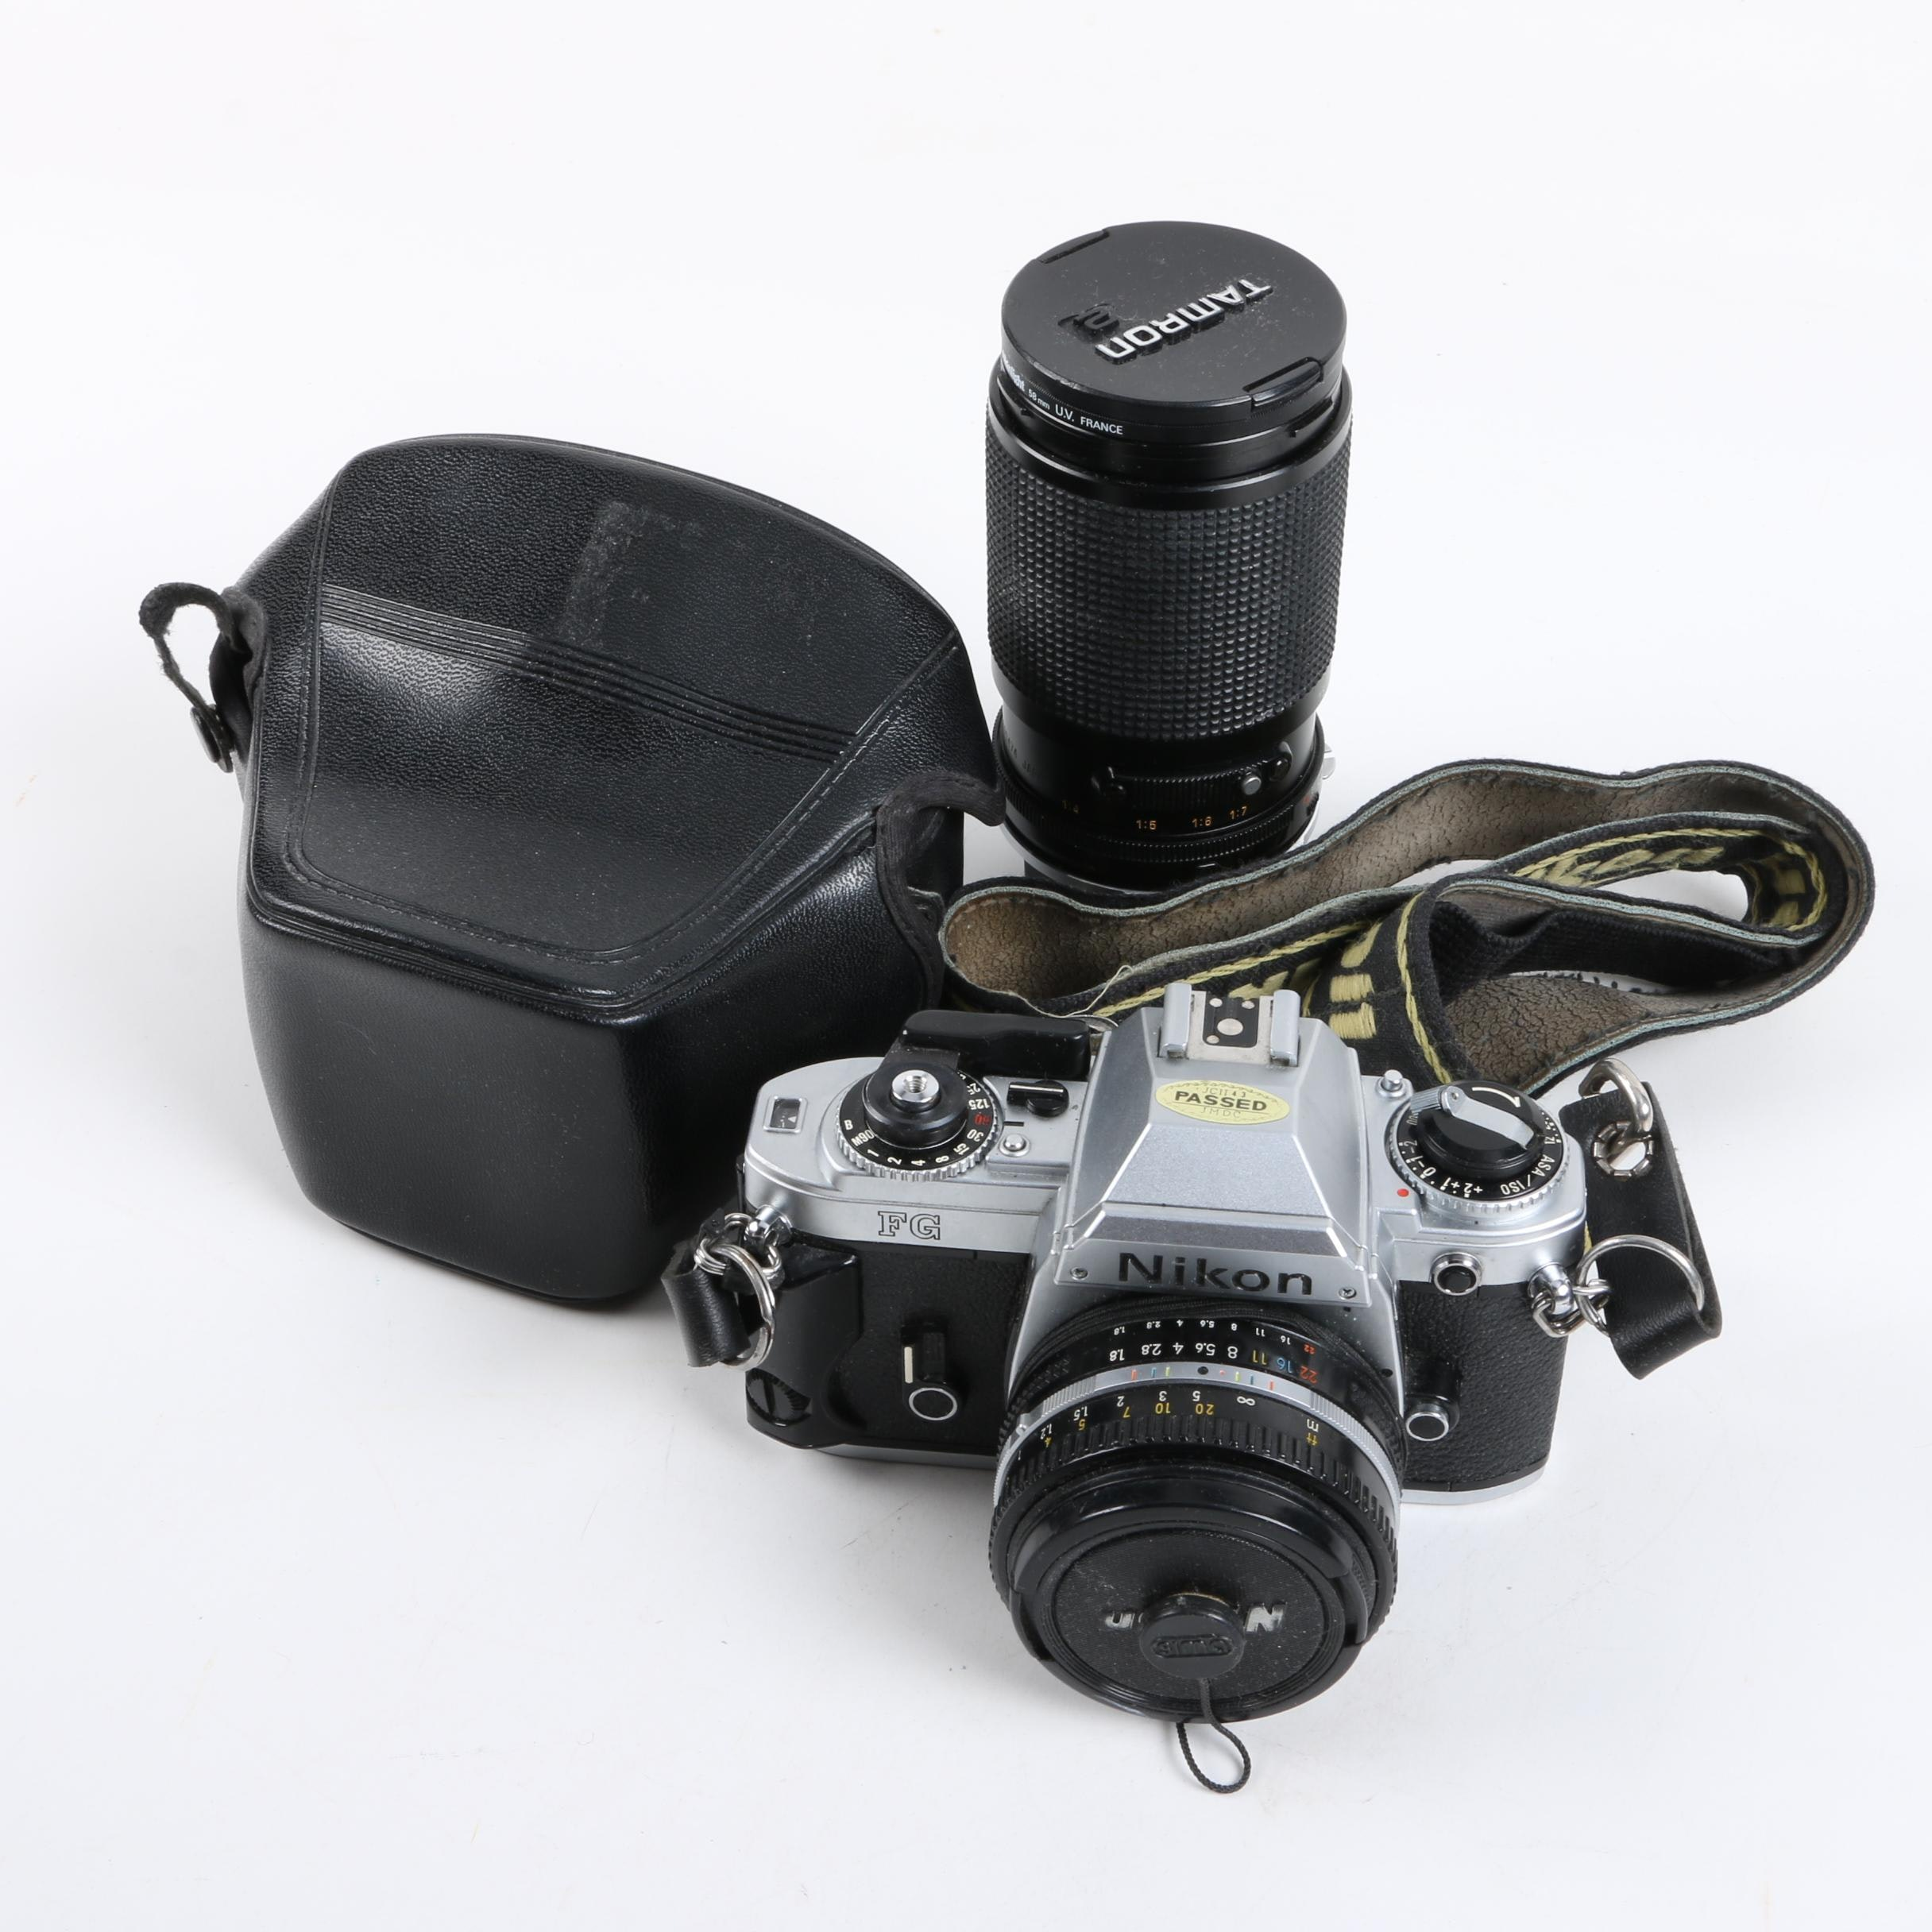 Nikon FG SLR Camera with Two Lenses